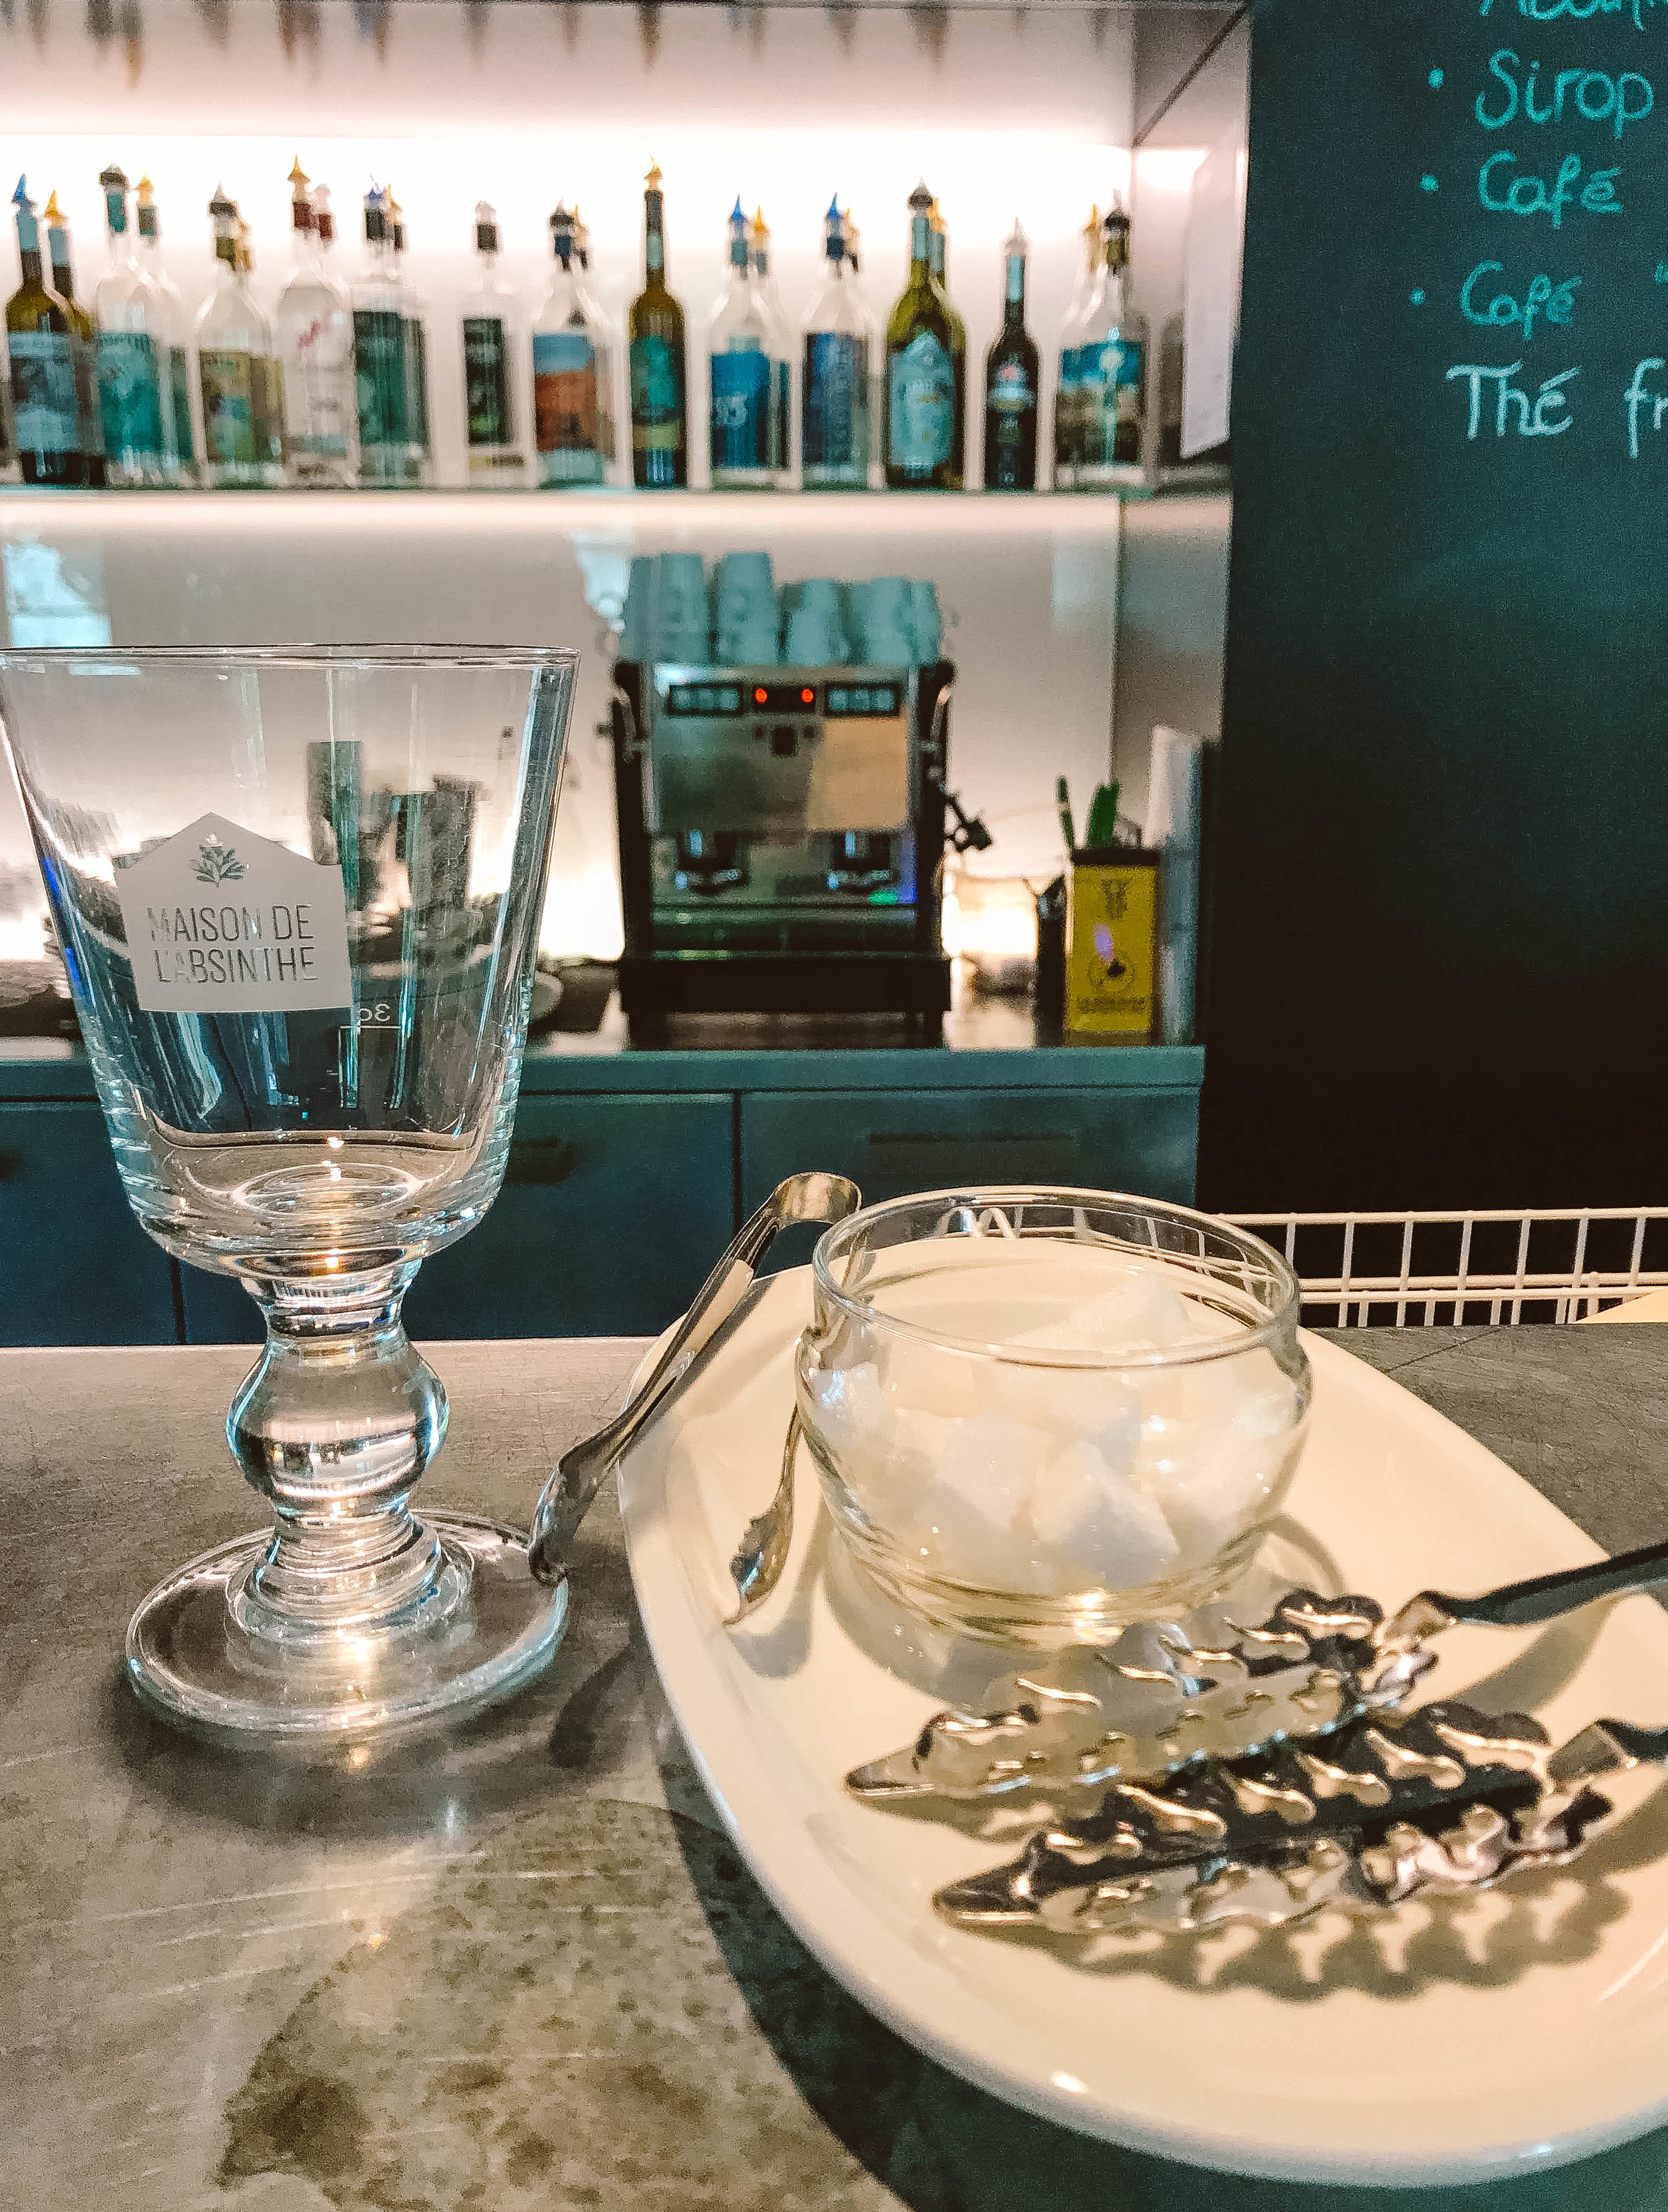 Absinthe tasting at Maison de l'Absinthe